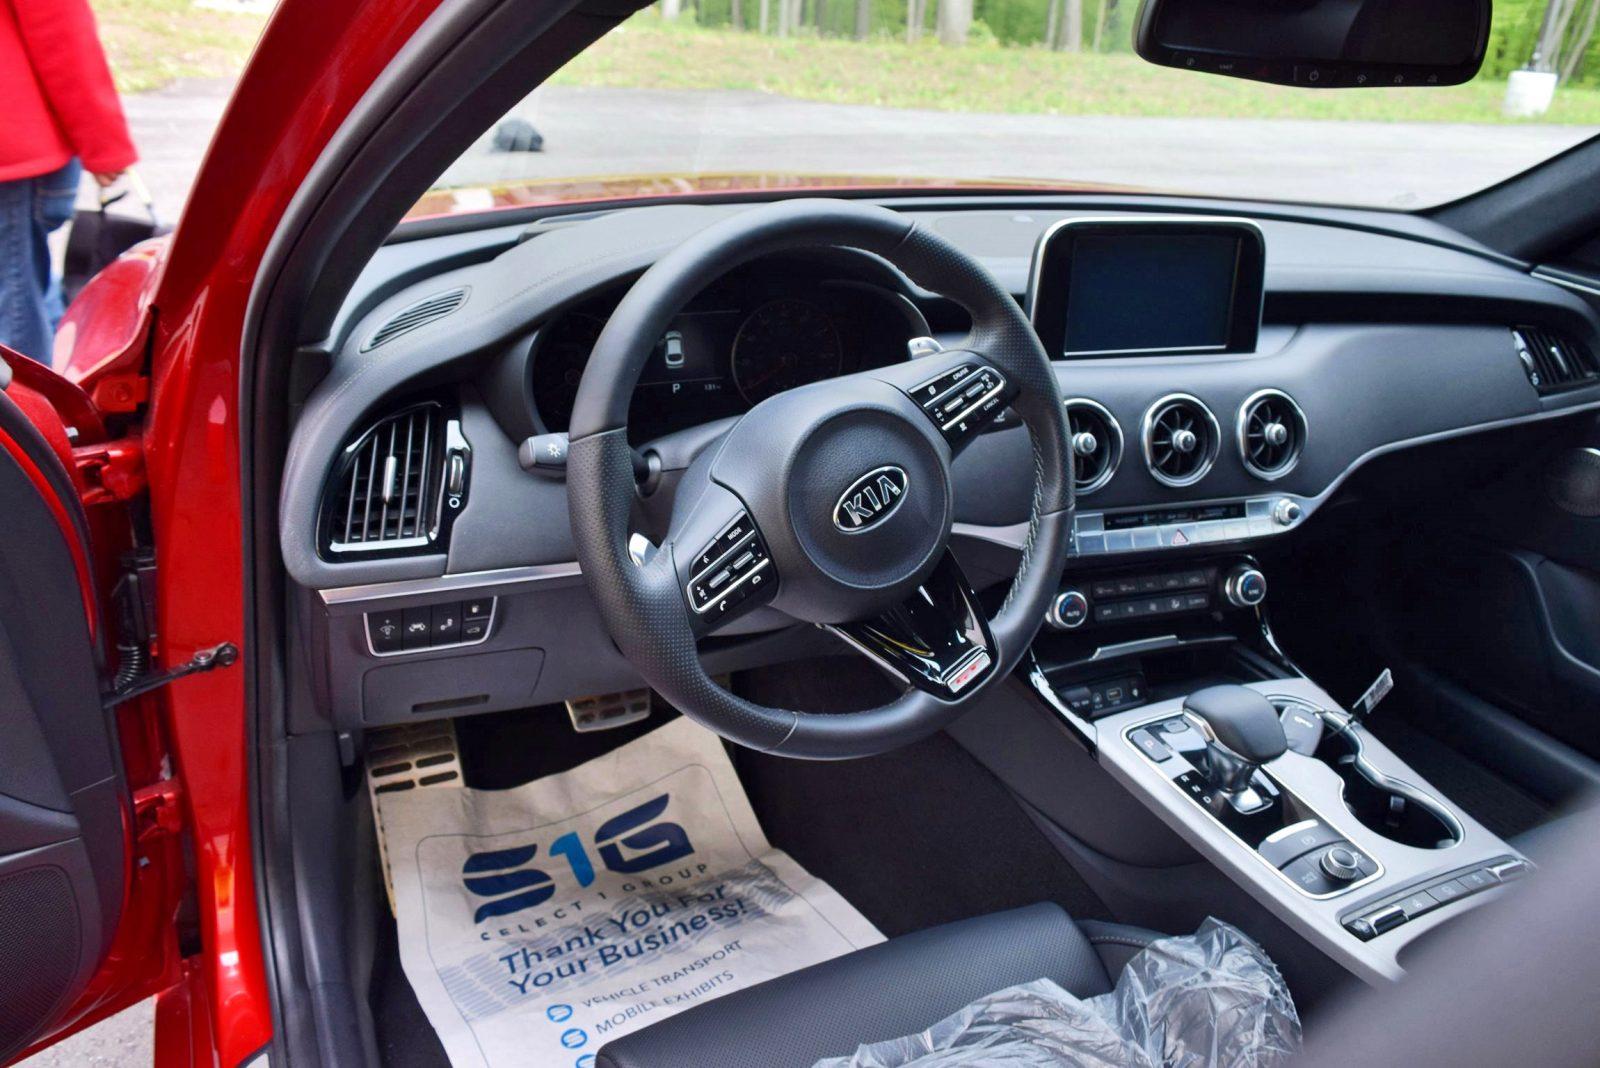 Lexus Latest Models >> 2018 KIA Stinger GT AWD - 4.8s, 167MPH Stats Confirmed - 31 Photos » LATEST NEWS